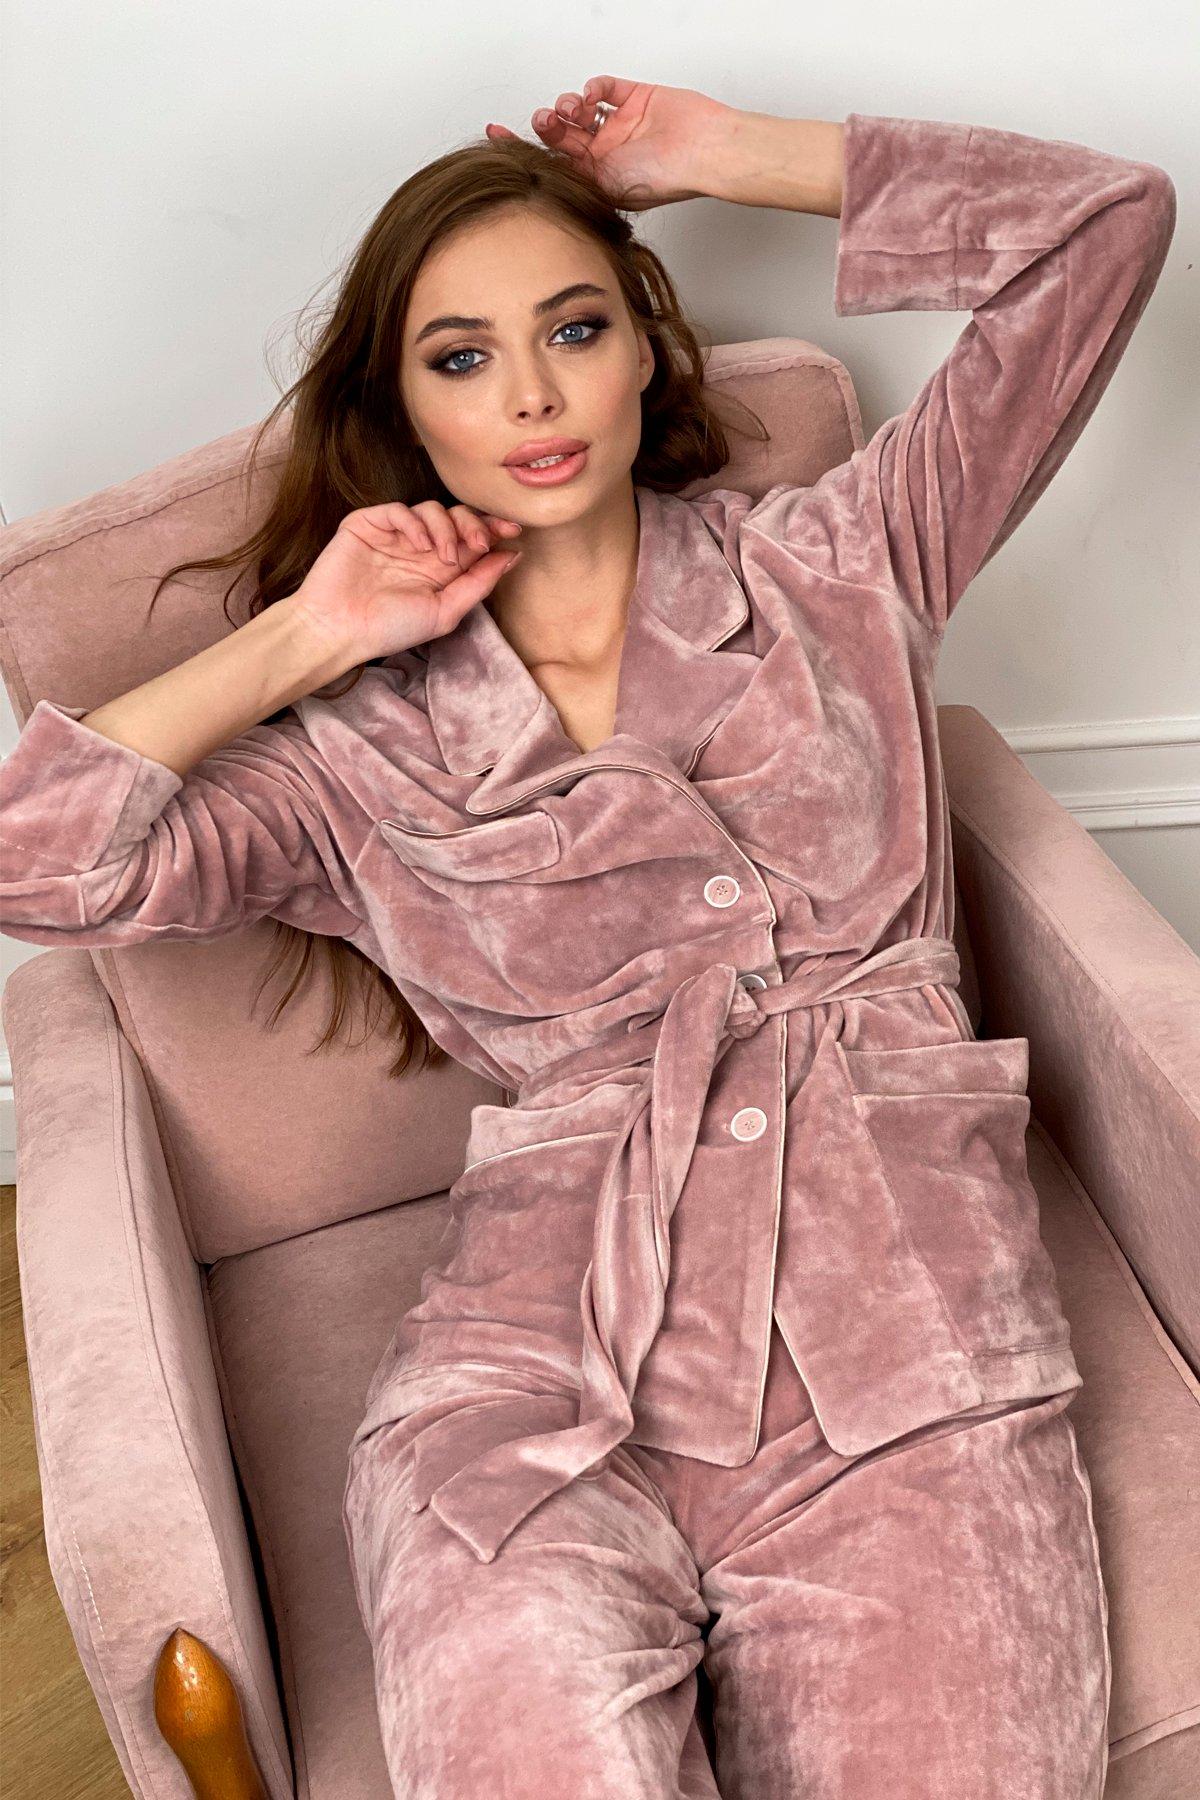 Шайн пижама велюр жакет брюки маска для сна 10353 АРТ. 46660 Цвет: Пудра - фото 5, интернет магазин tm-modus.ru